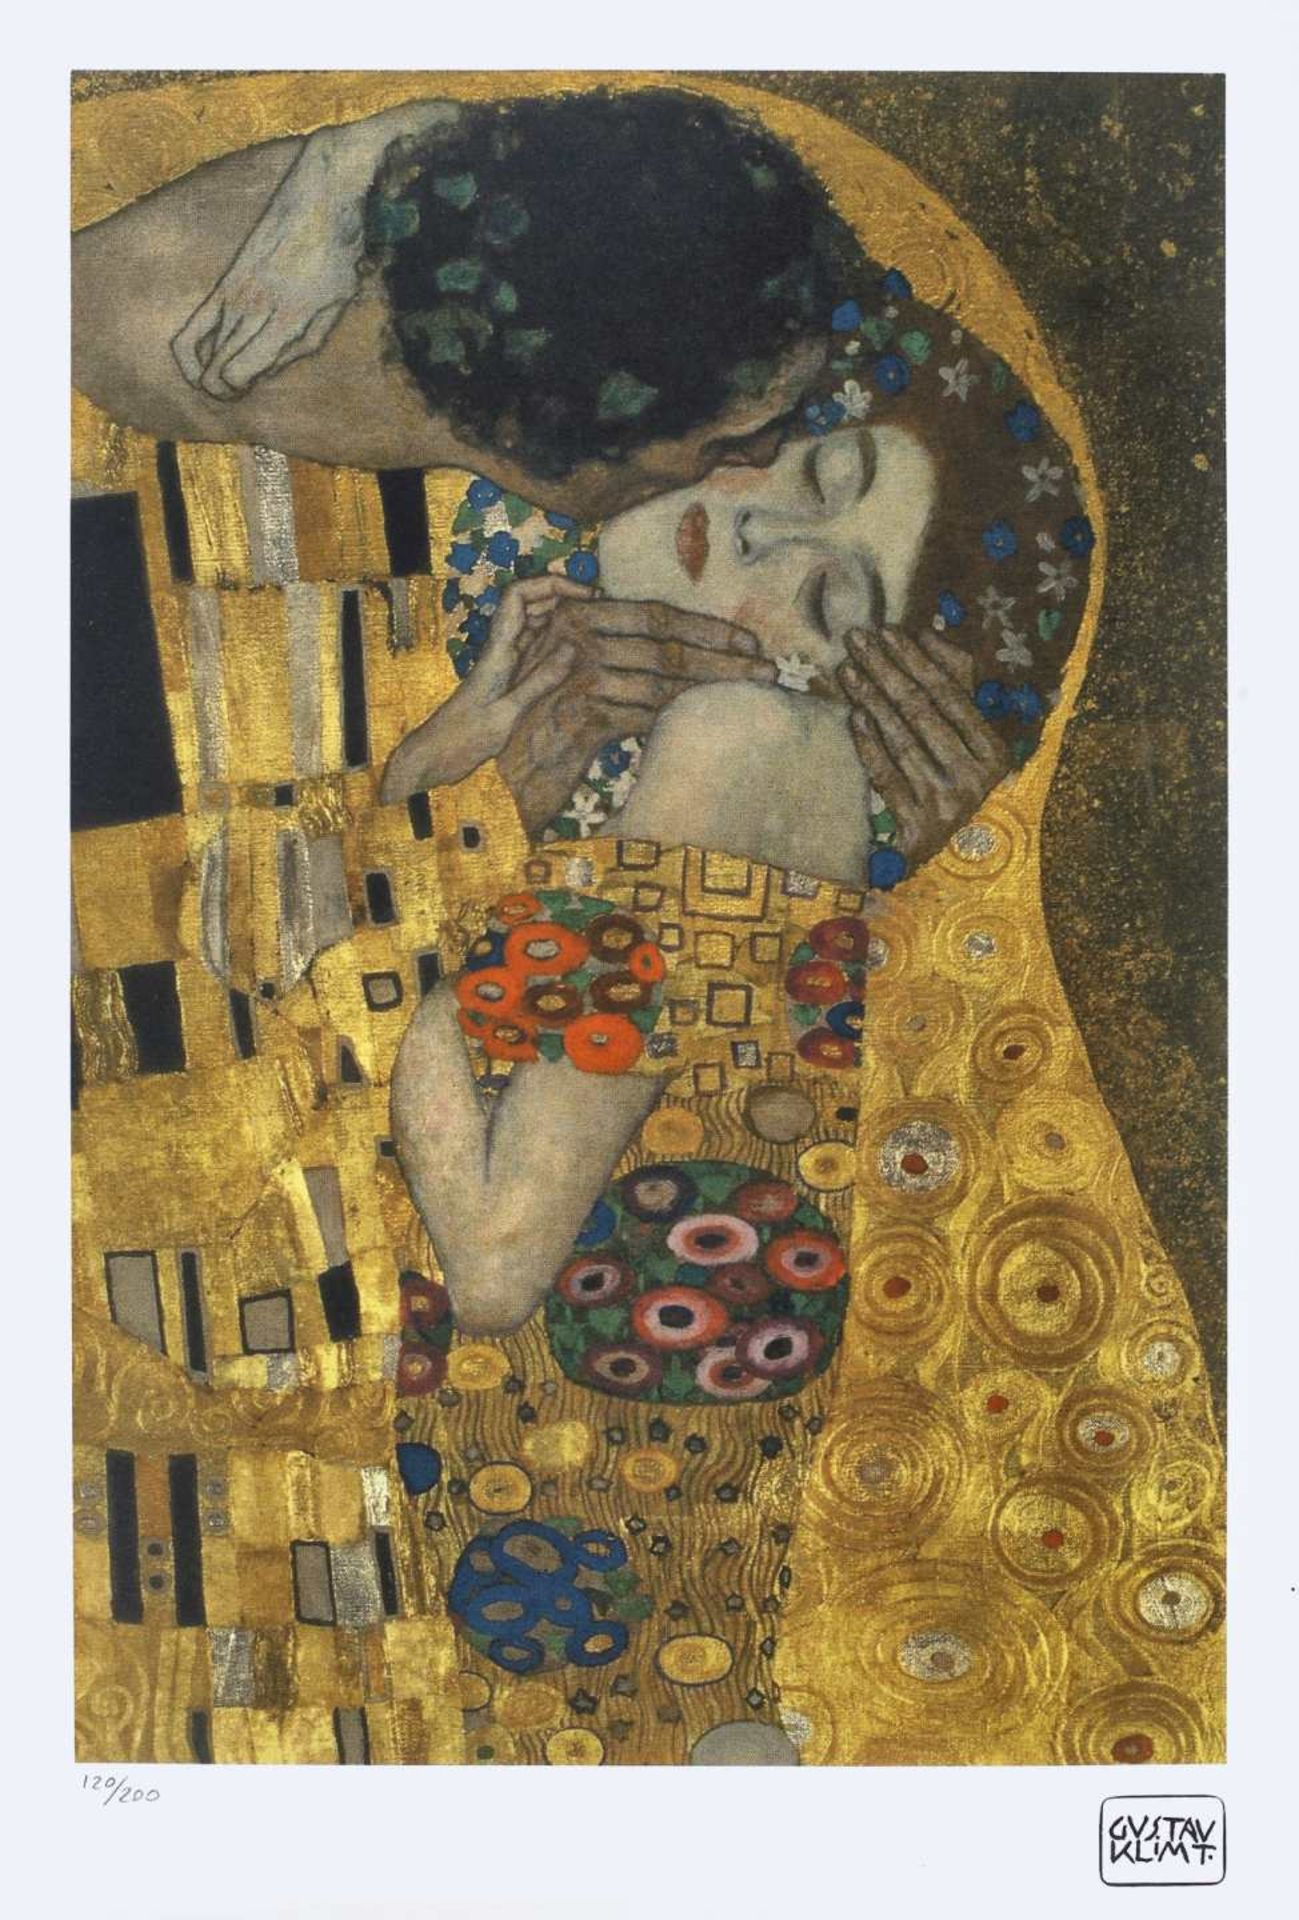 Gustav Klimt, The KissGustav Klimt, The Kiss, chromolithography, 44 × 30 cm, signed bottom rig